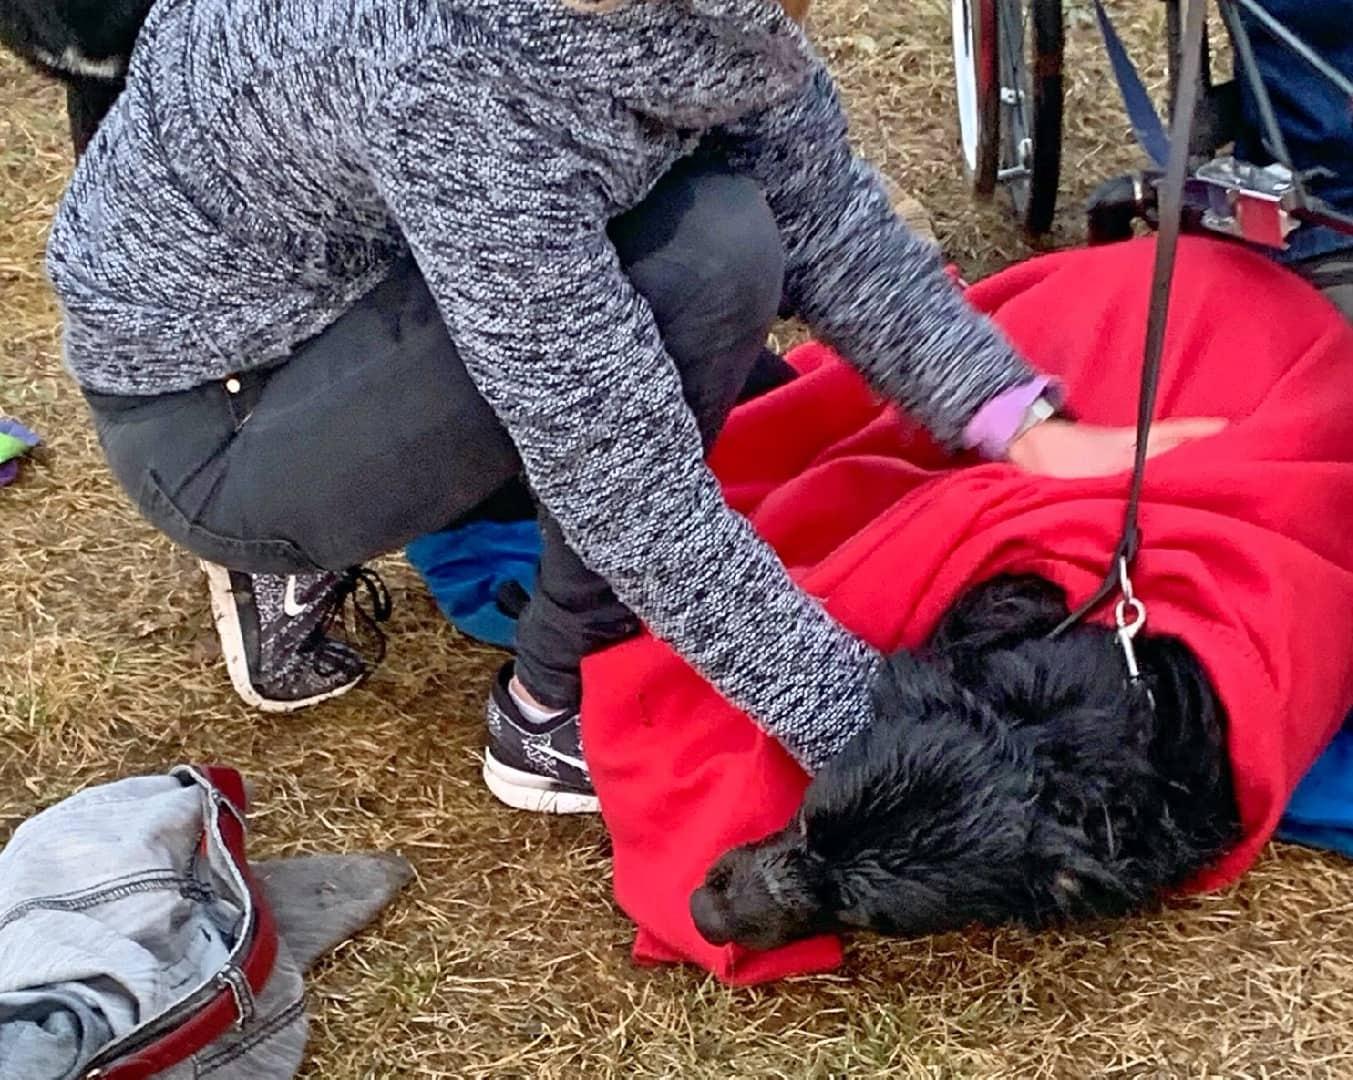 Hundehalterin aus Silbersee gerettet